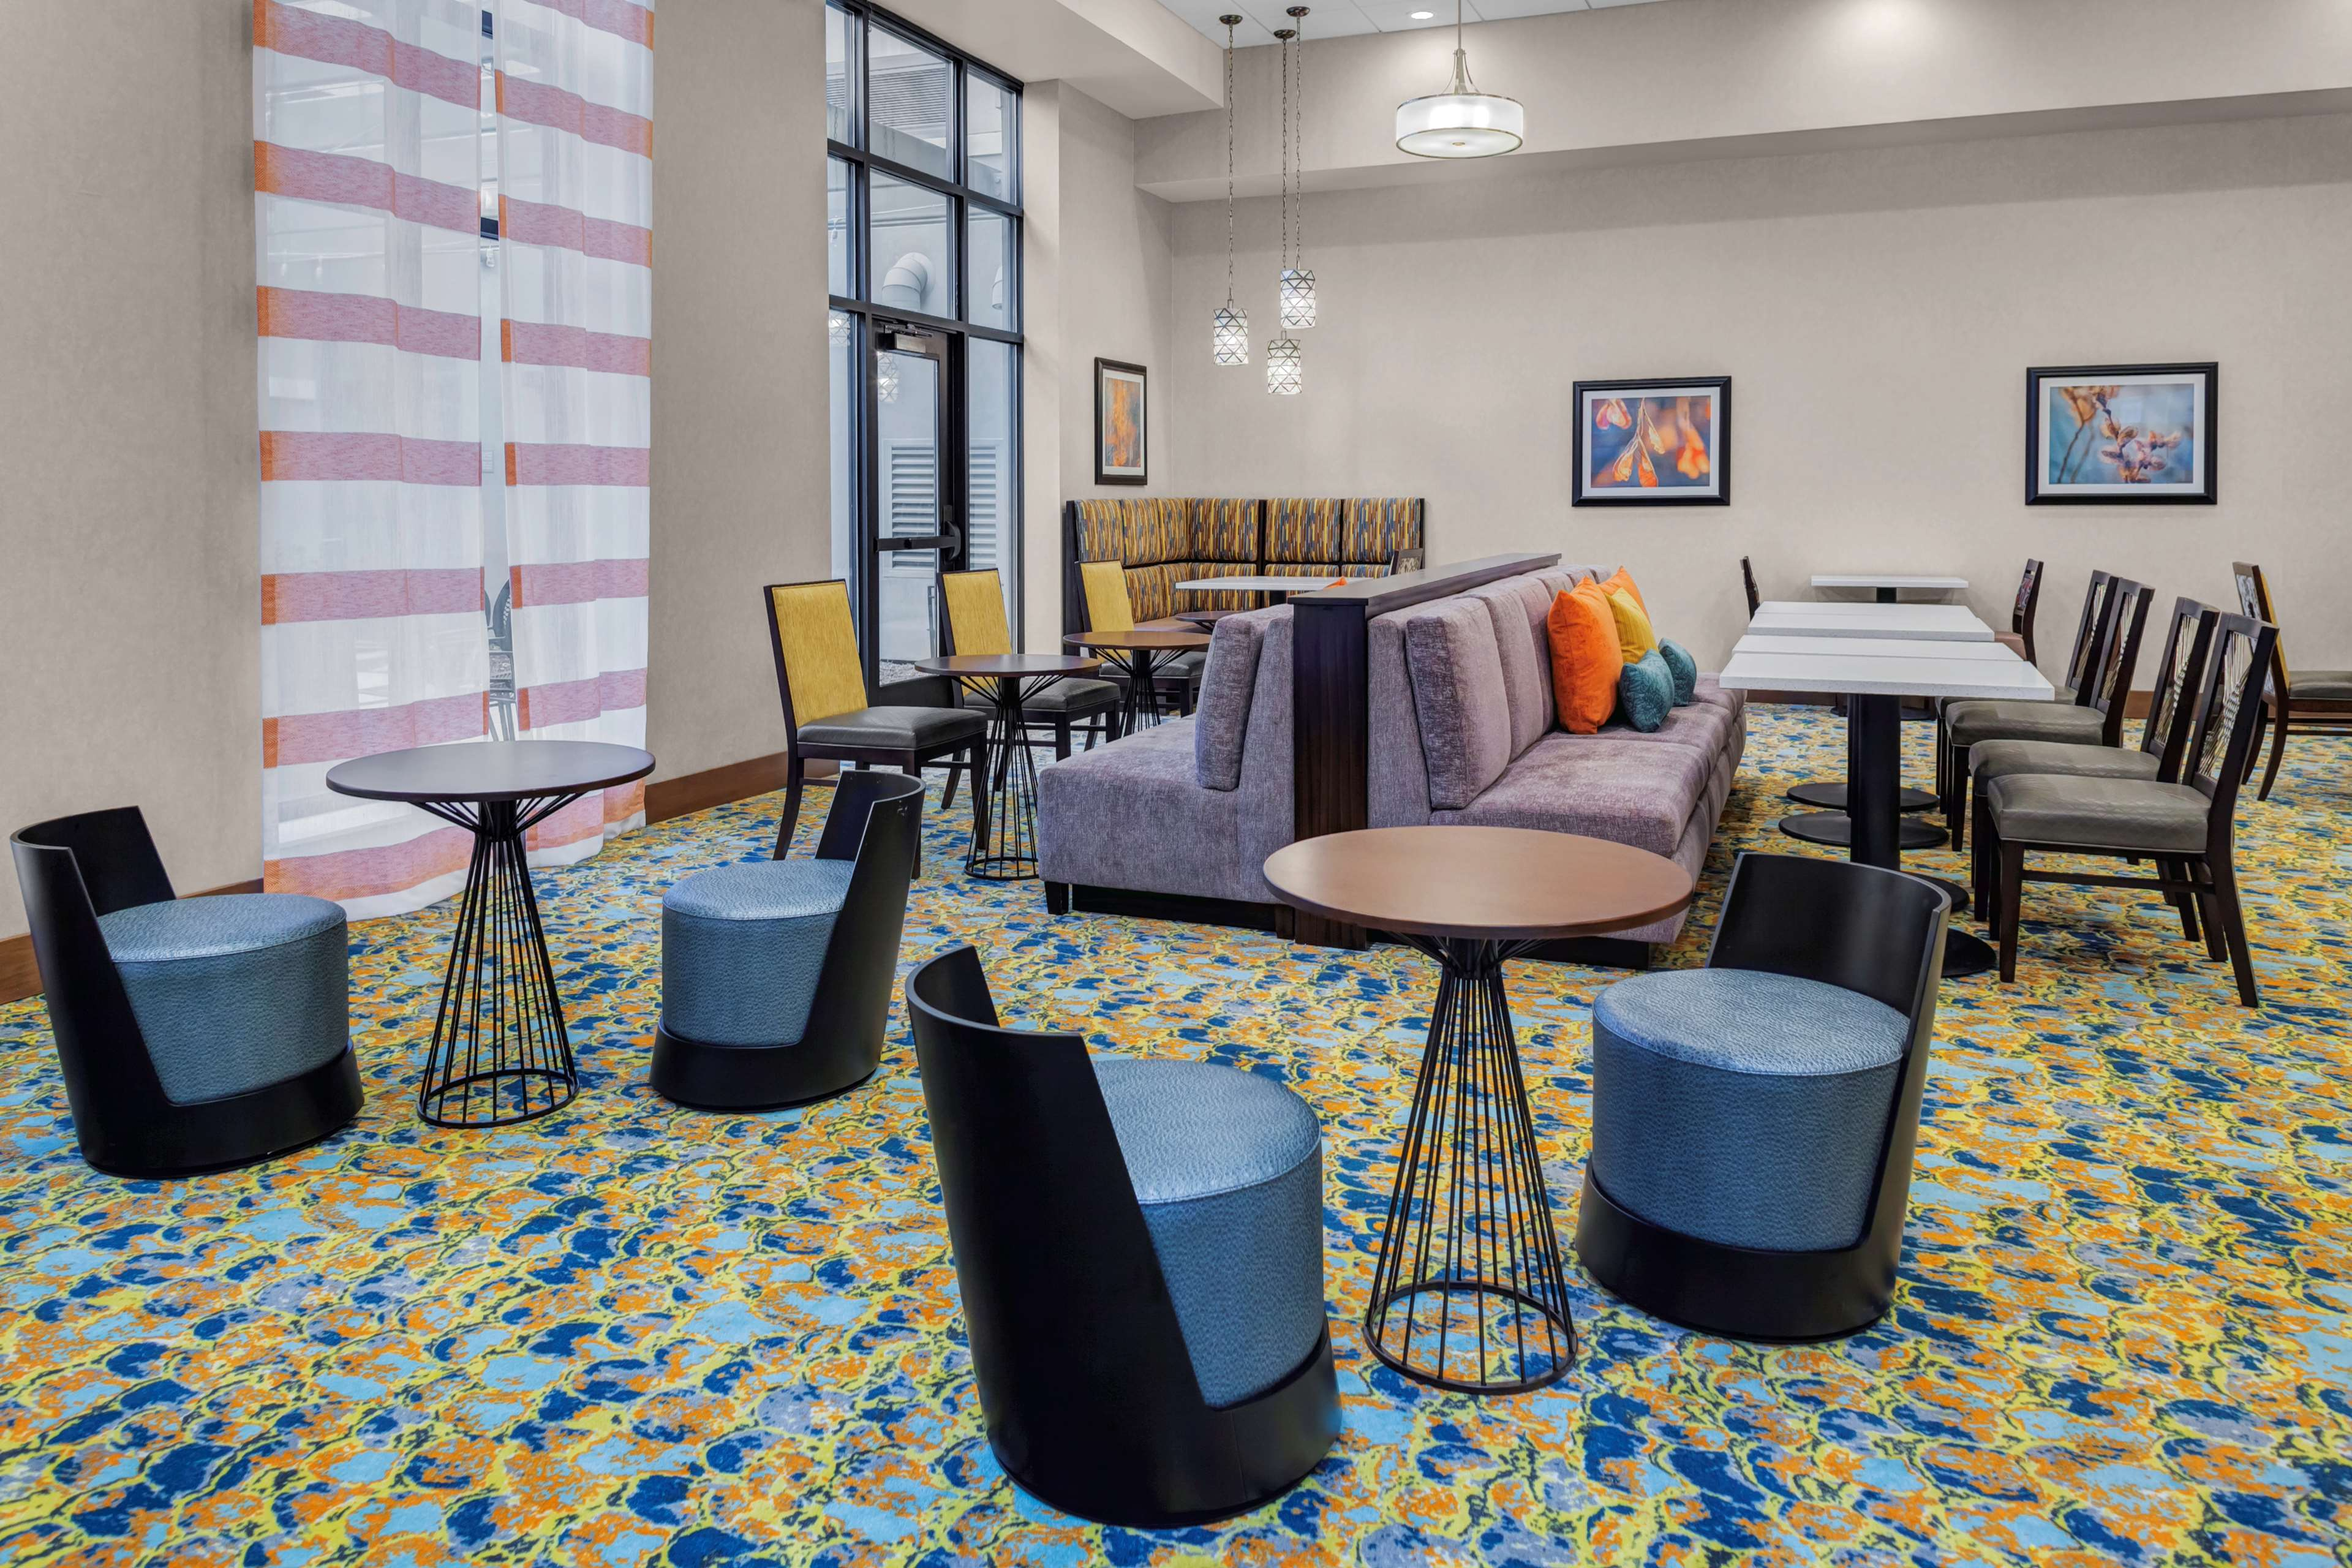 Homewood Suites by Hilton Wauwatosa Milwaukee image 1